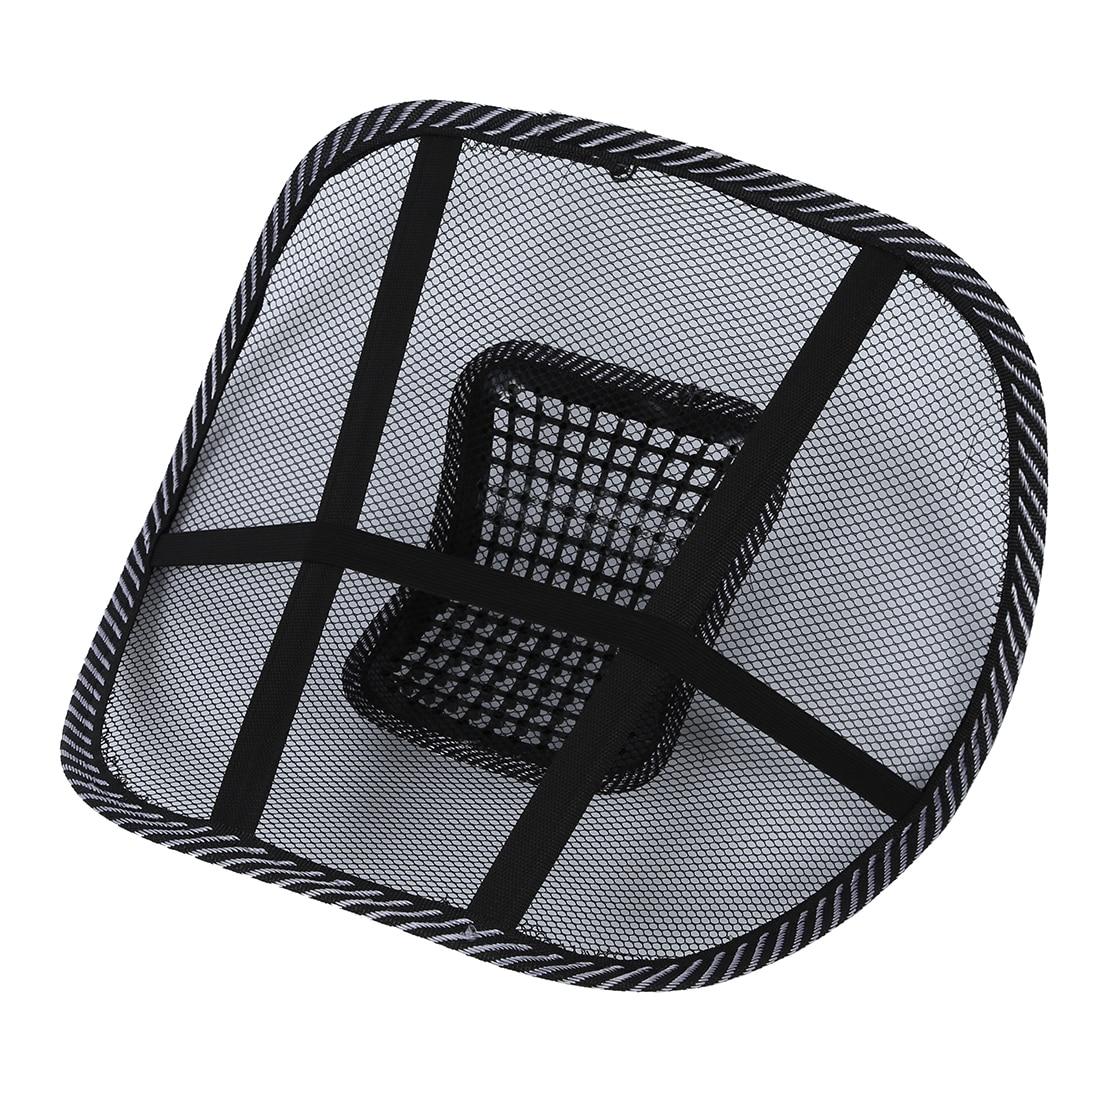 Autostoel Stoel Massage Kussen Kussen Demper Lumbale Kussen Zwart + Wit